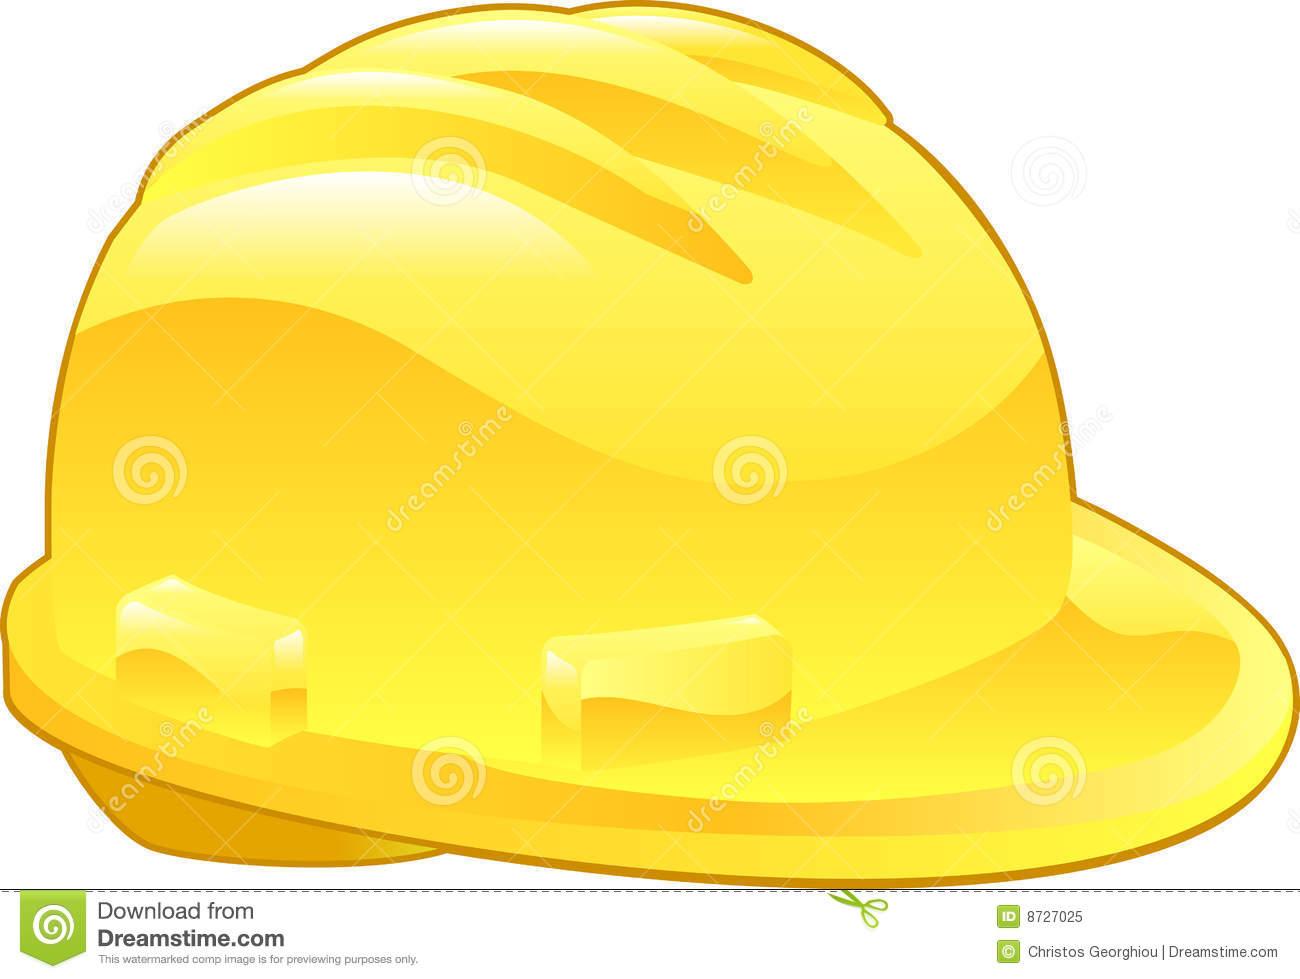 yellow hard hat clipart - photo #26